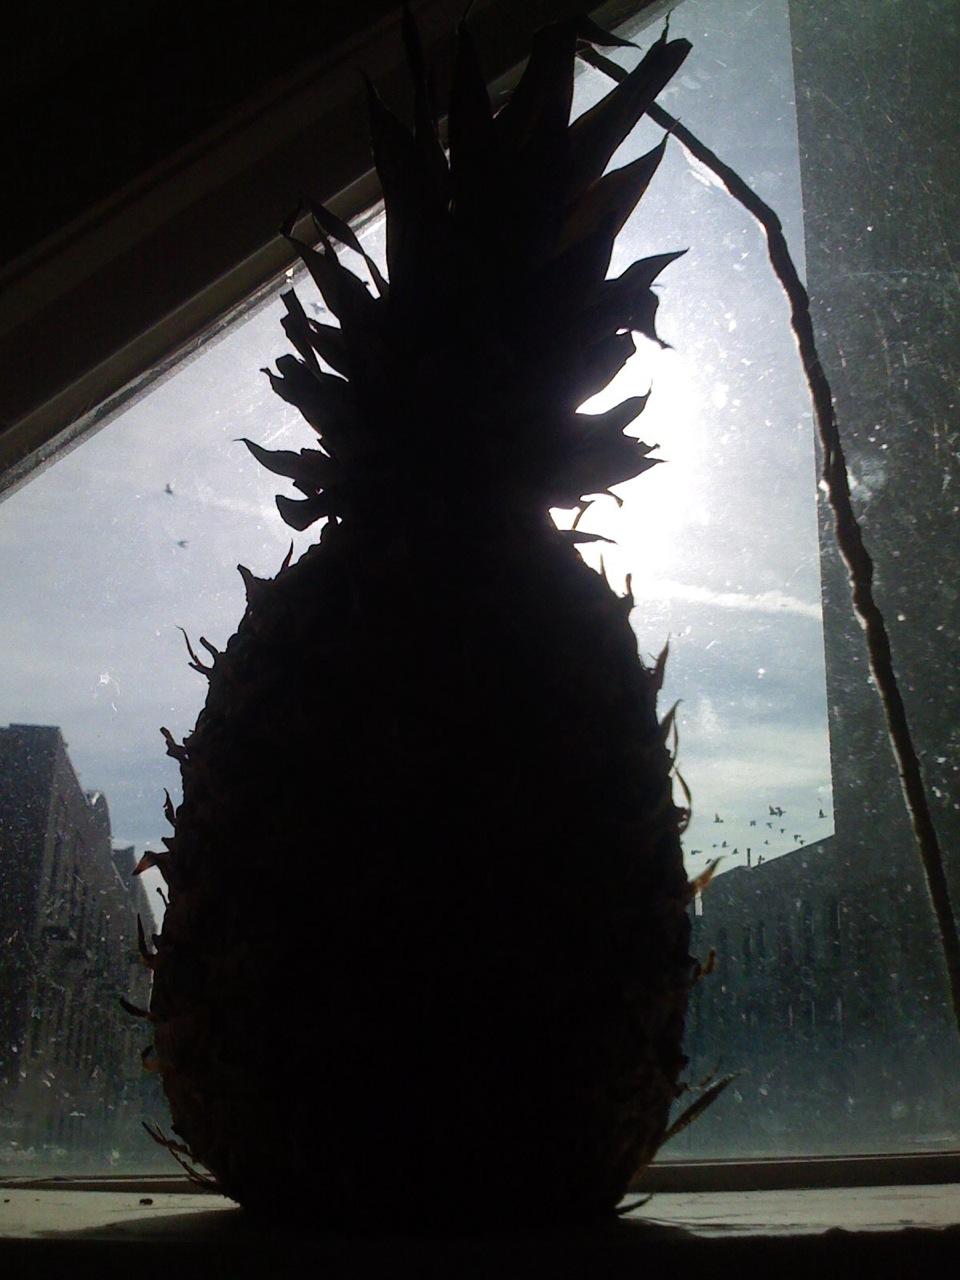 Iphone X Pineapple